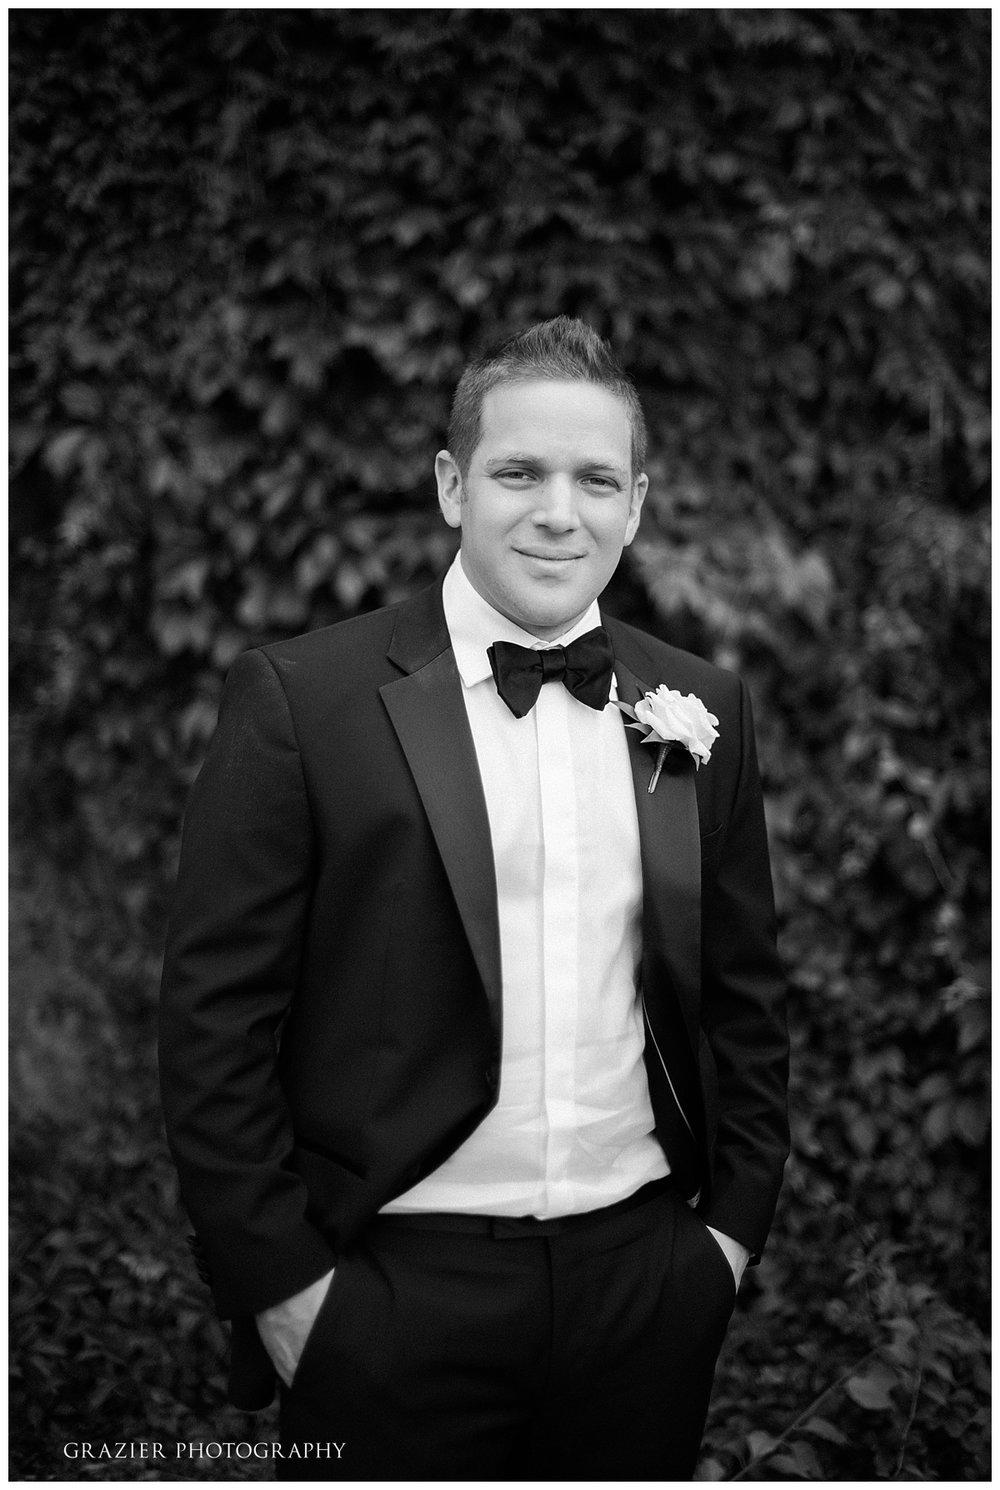 Mount Washington Hotel Wedding Grazier Photography 171125-433_WEB.jpg